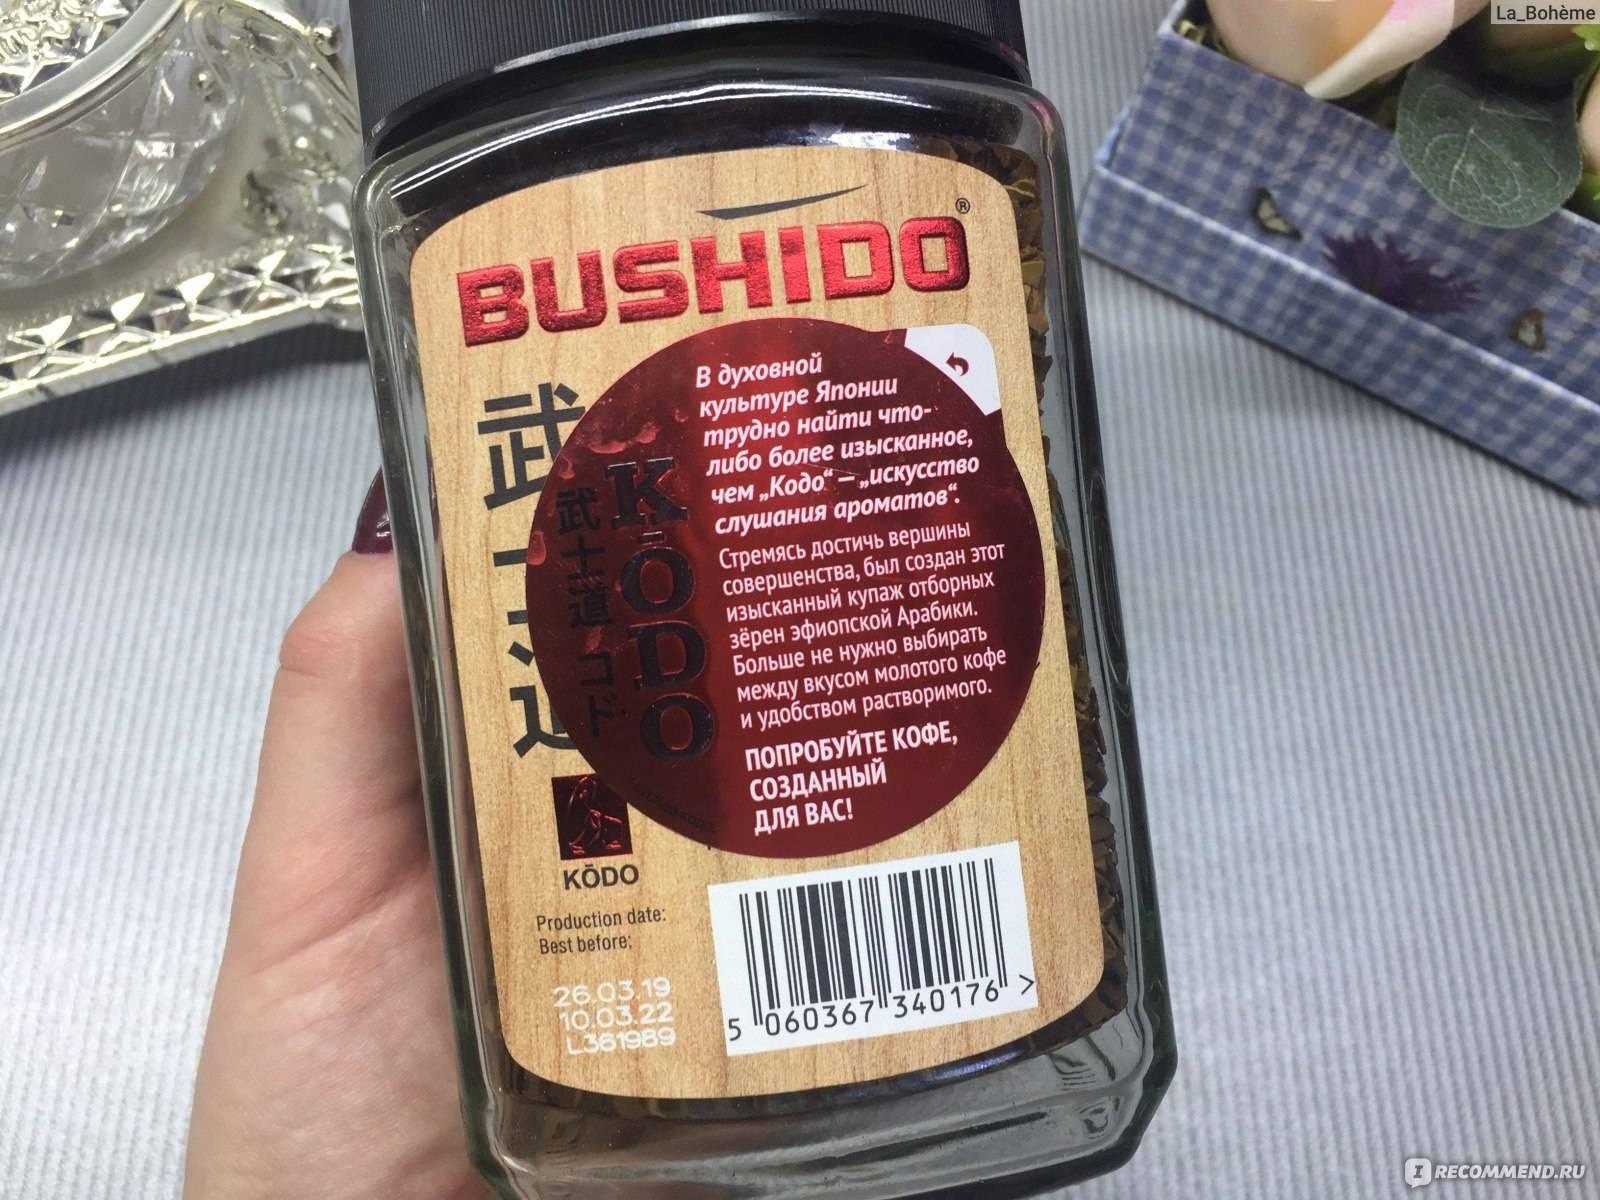 Японский виски: история, производство, марки, виды, отличия